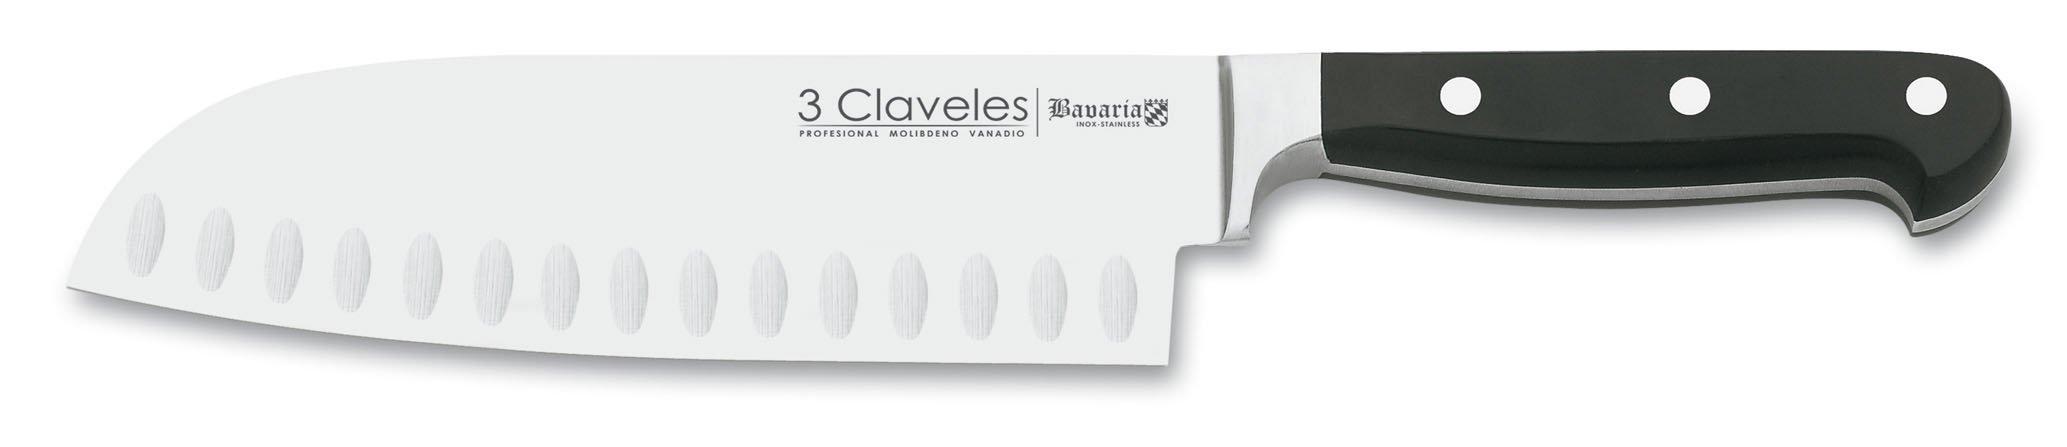 3 Claveles Cuchillo, 18 cm-7